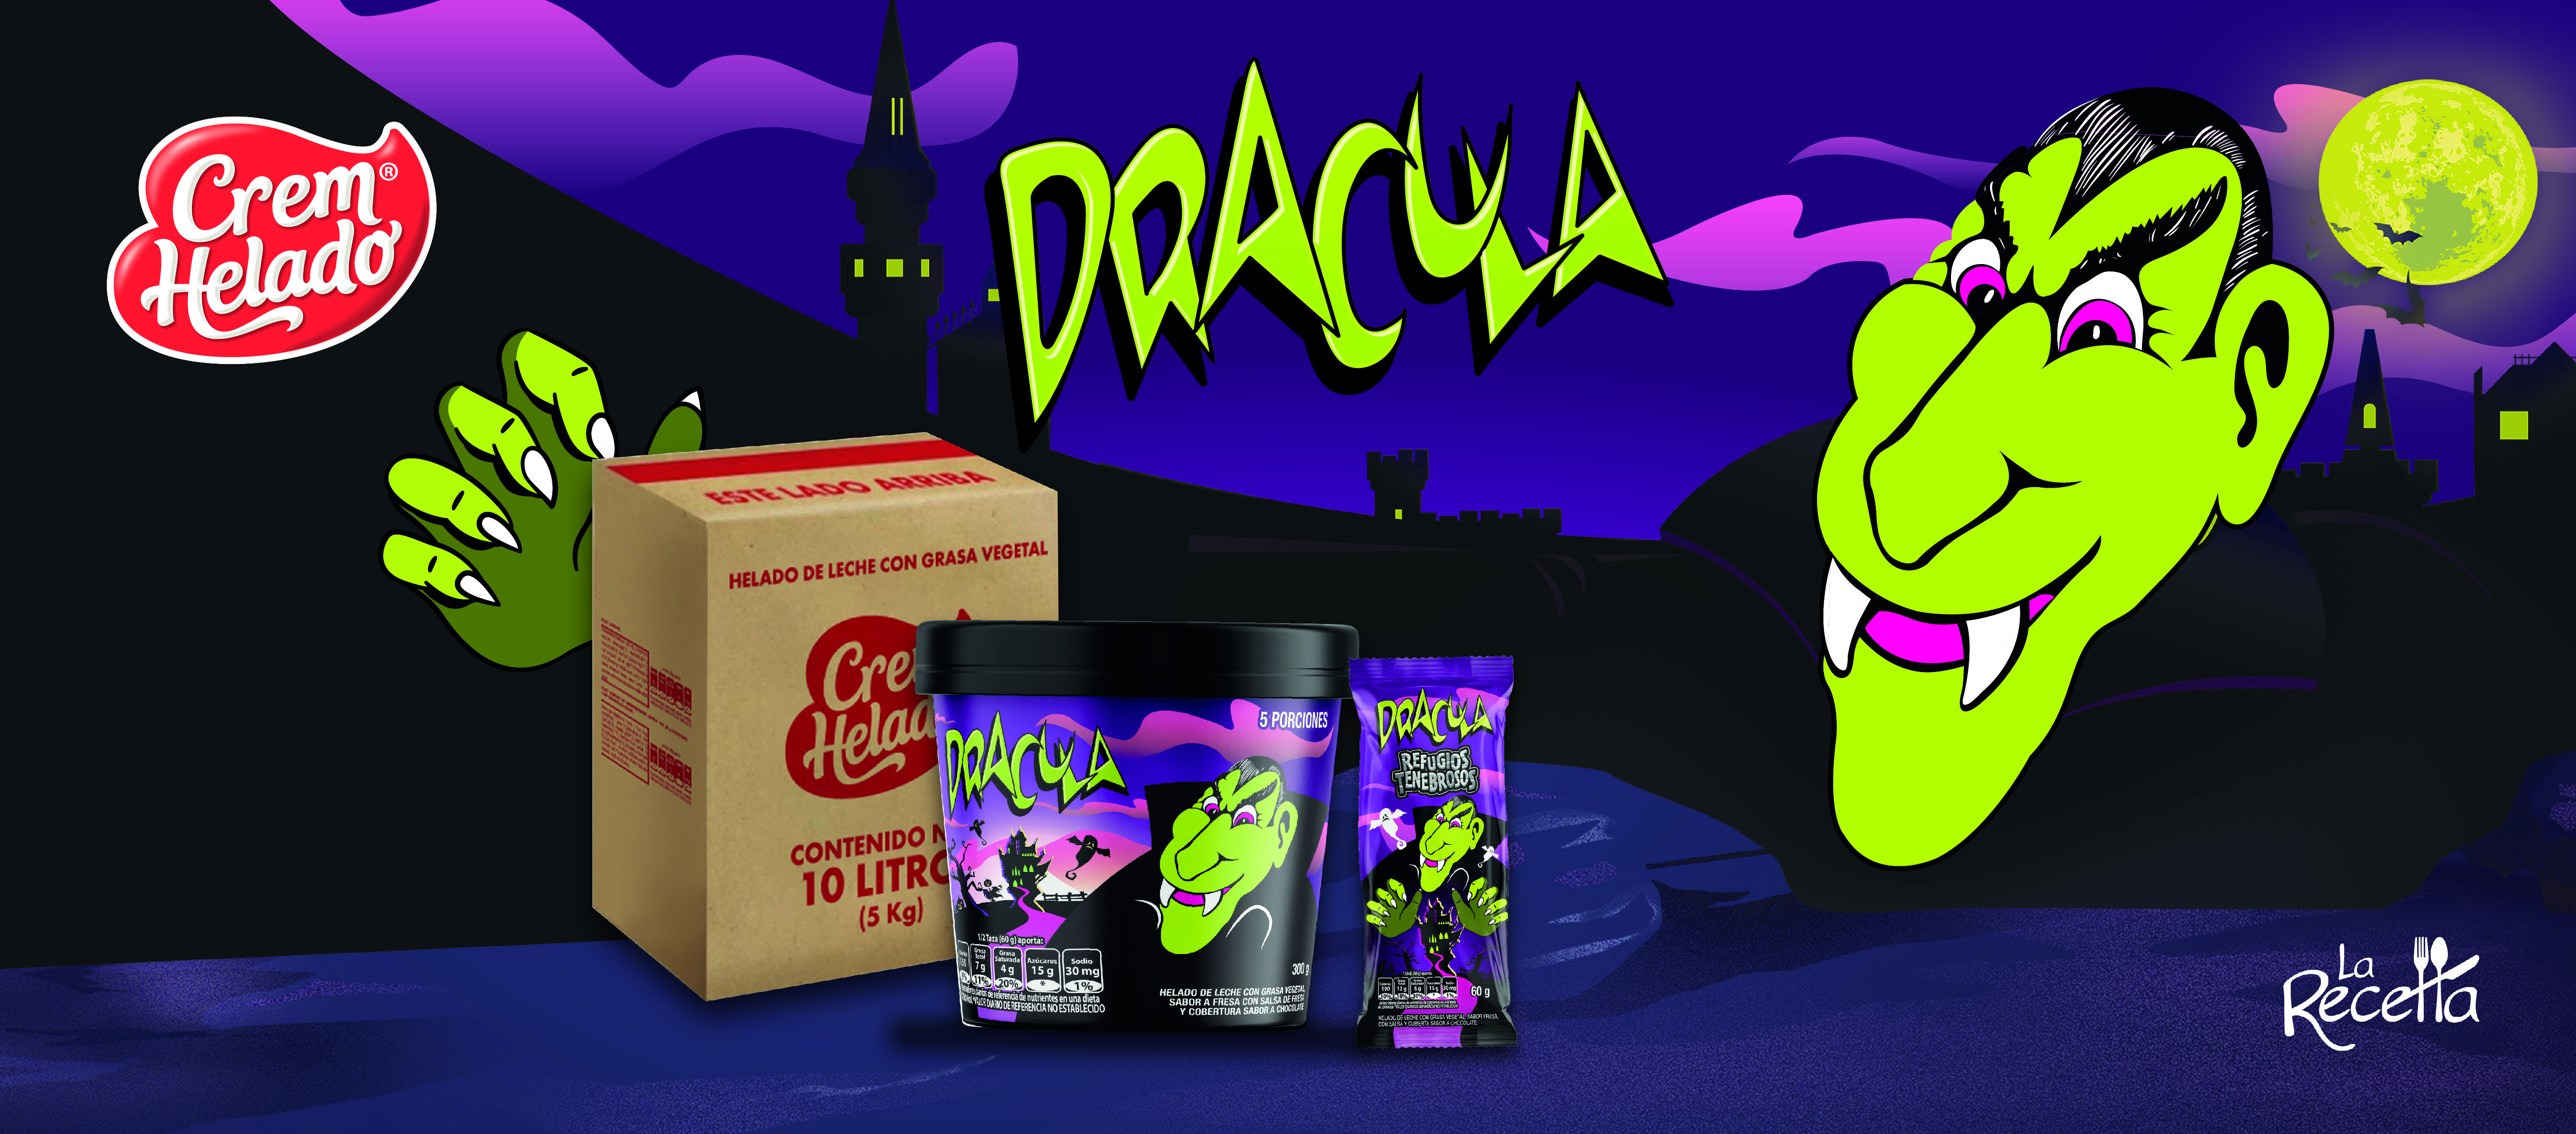 Dracula -Octubre 2021 (MEALSS)